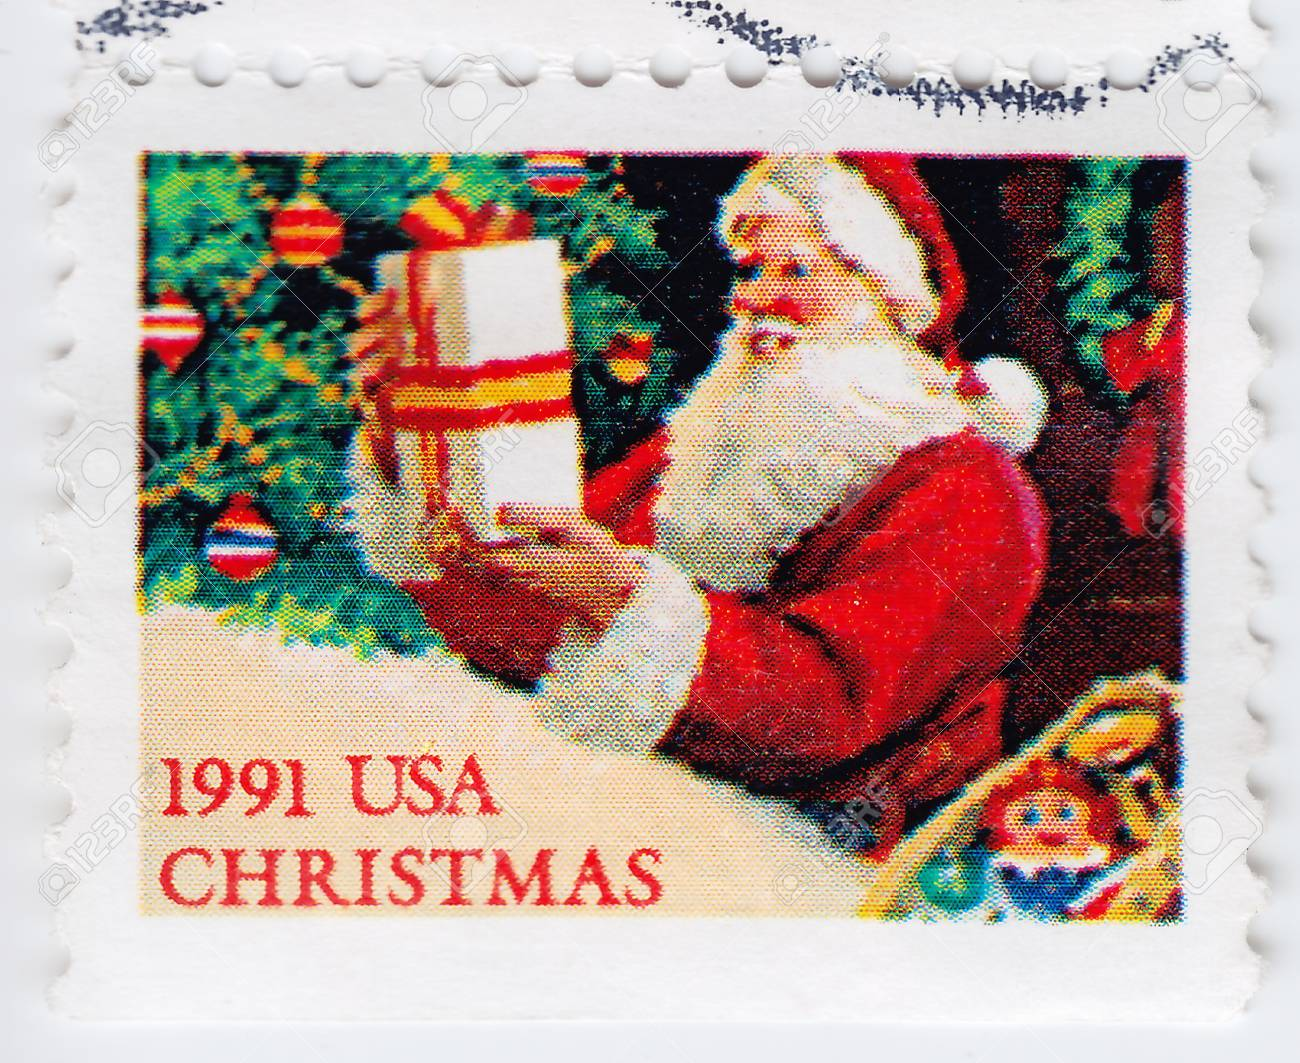 USA - CIRCA 1991 : stamp printed in USA shows Santa with gift, circa 1991 Stock Photo - 16393553